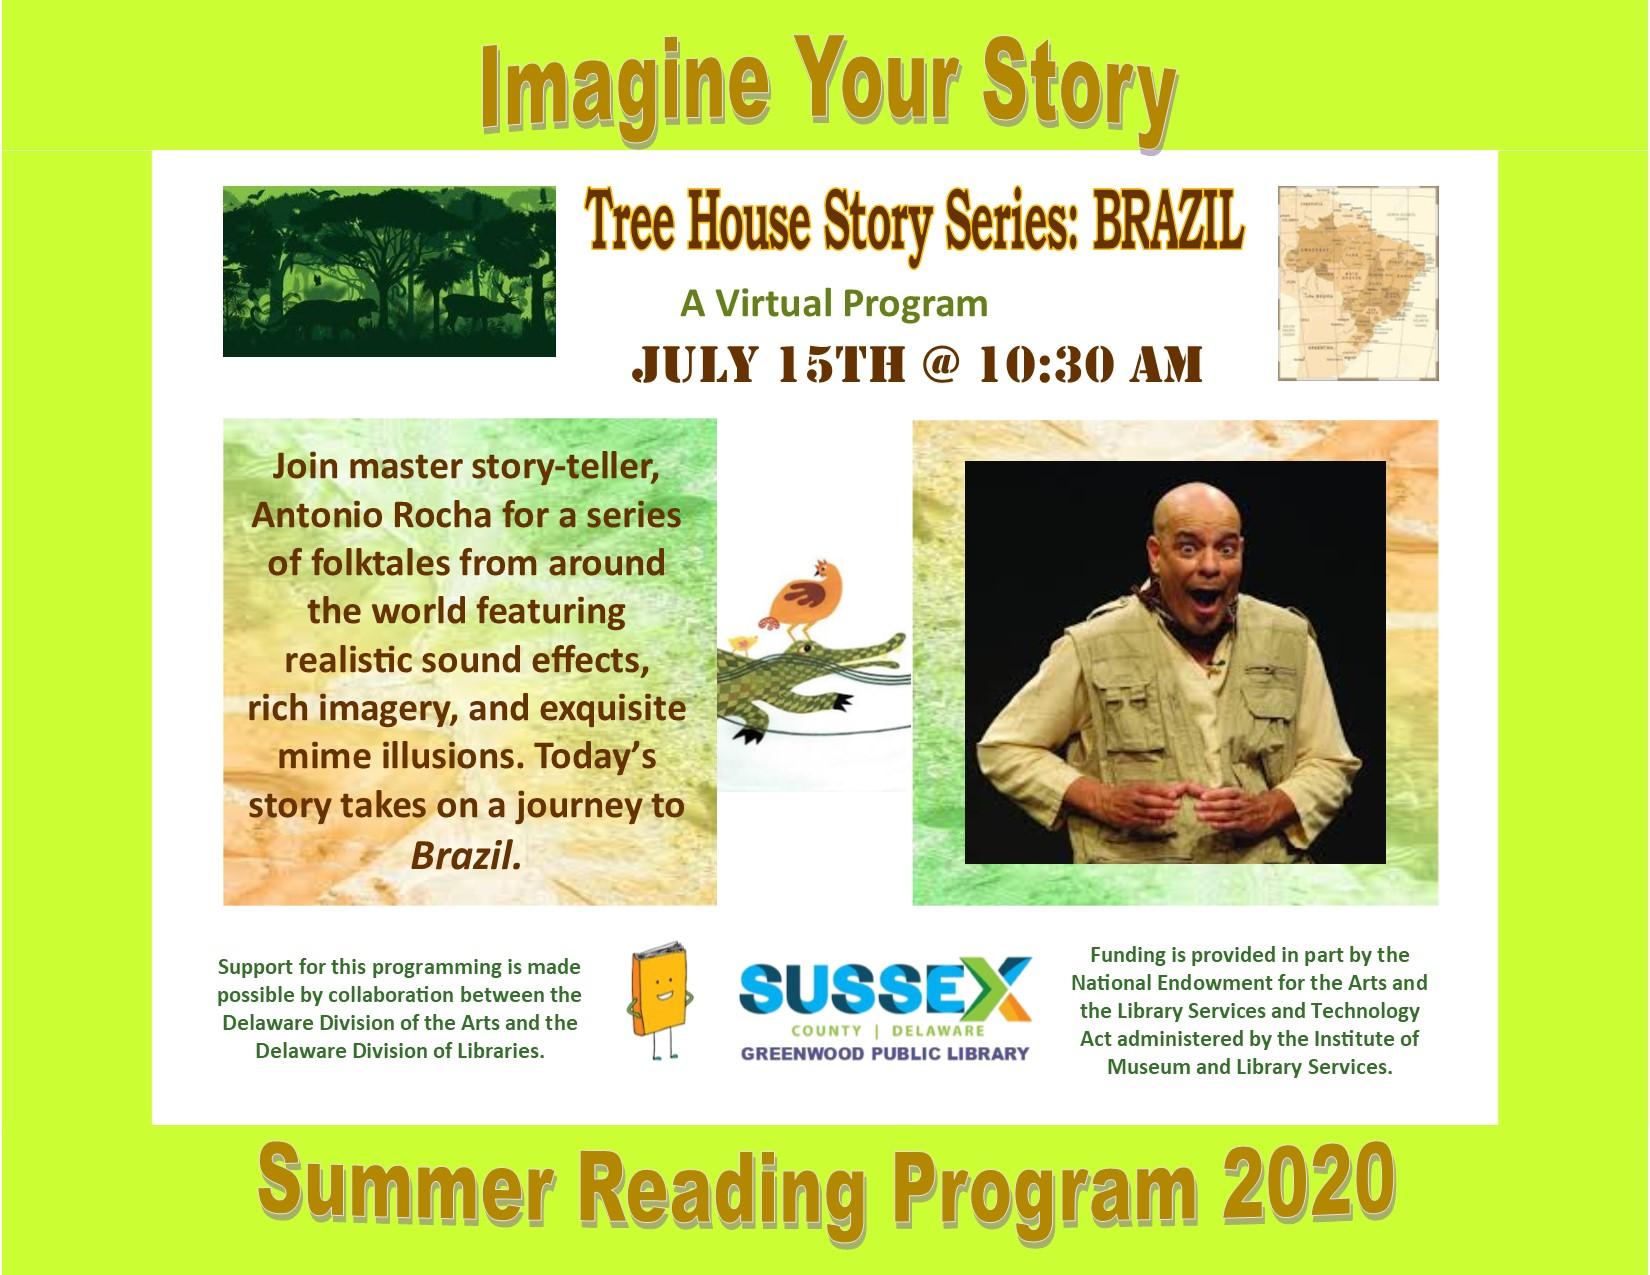 Antonio Rocha: Tree House Story Series, BRAZIL